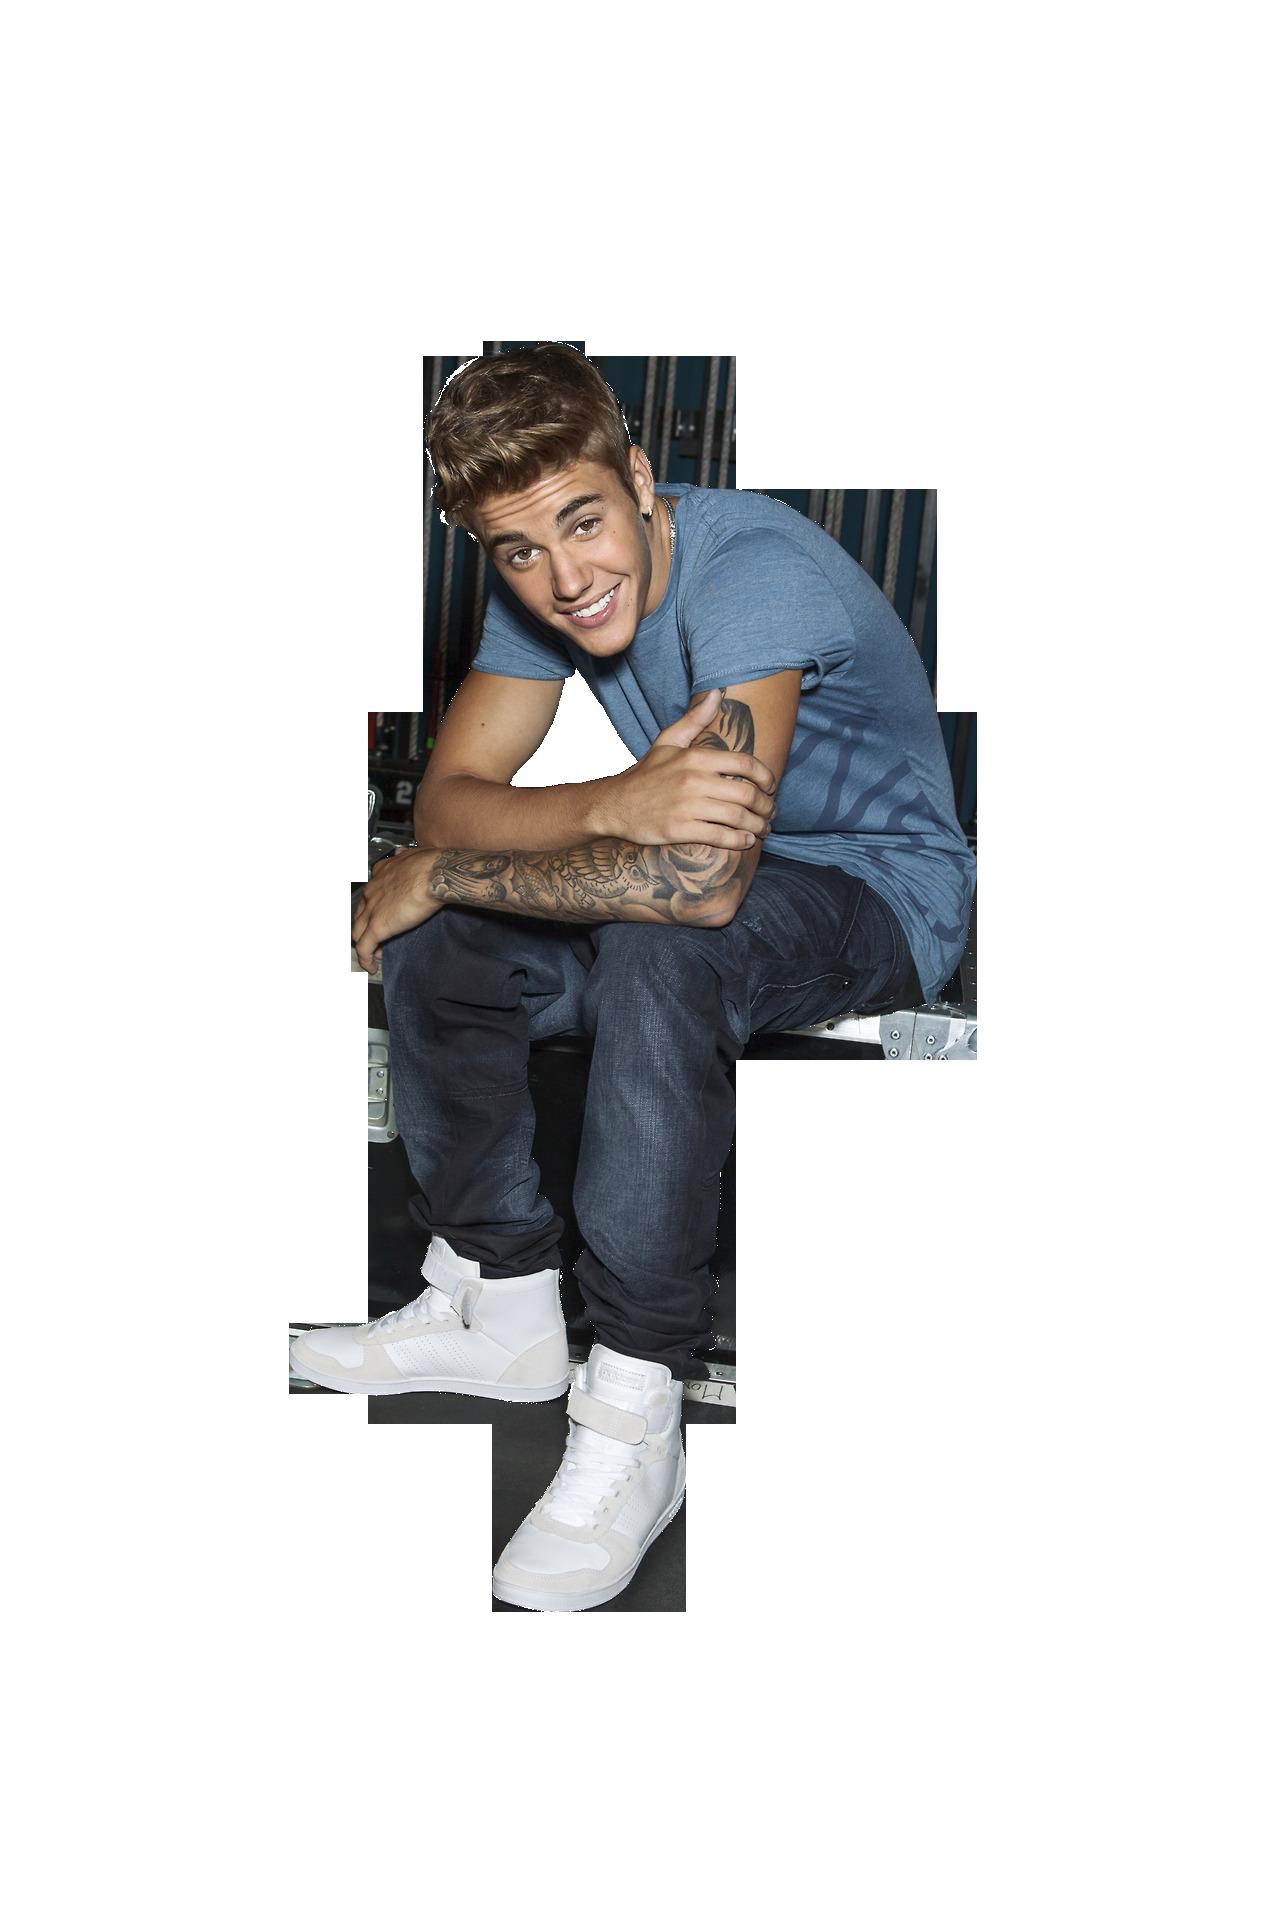 Justin Bieber Shoes White